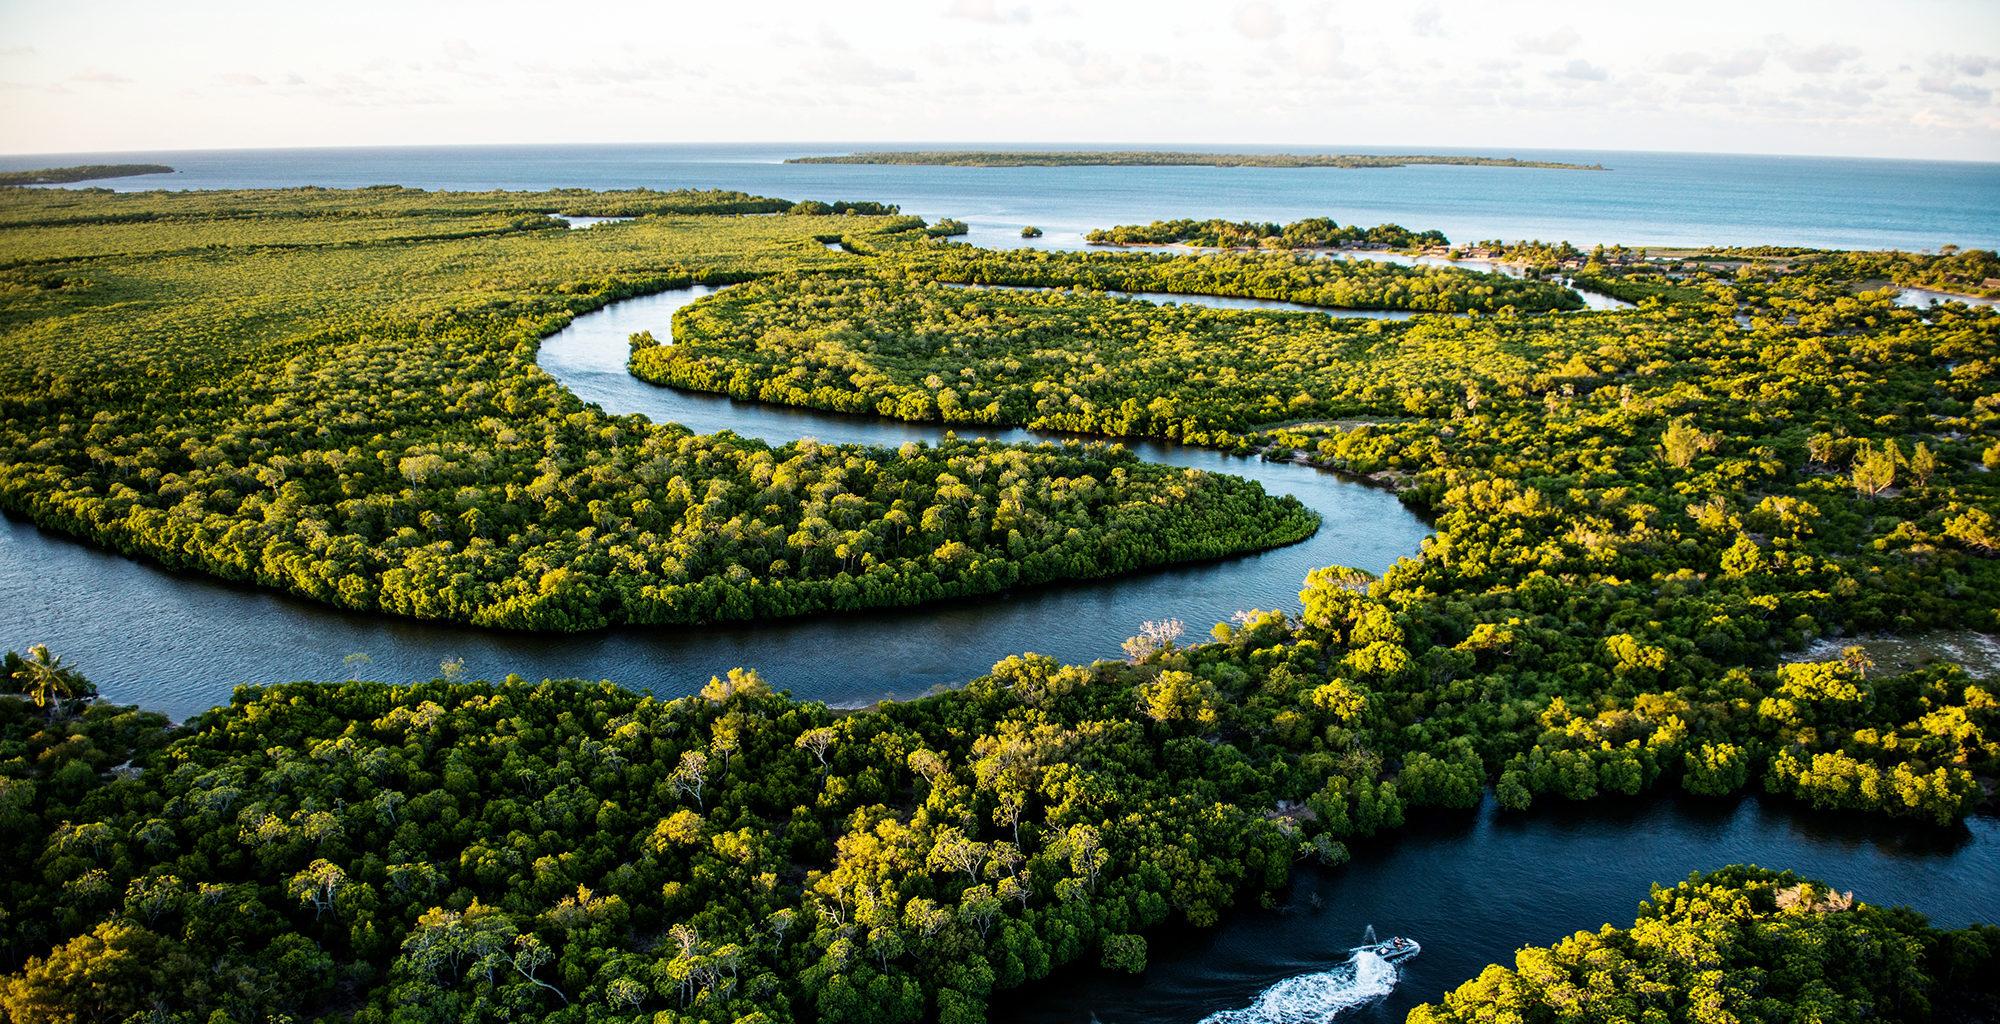 North-Madagascar-Aerial-Landscape